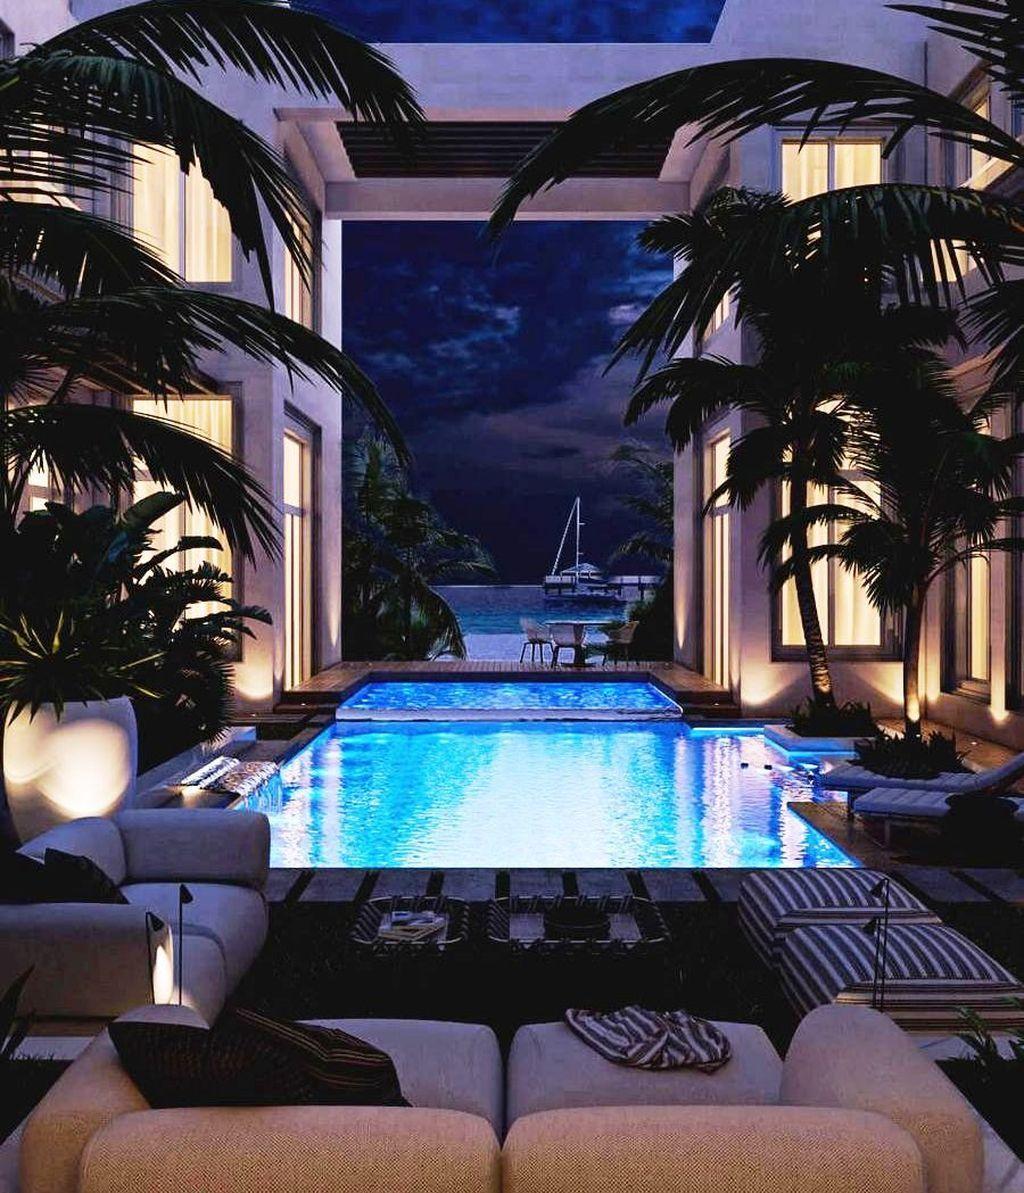 49 Fantastic Luxury Garden Decor Ideas Appartement Luxe Penthouse De Luxe Maison De Luxe